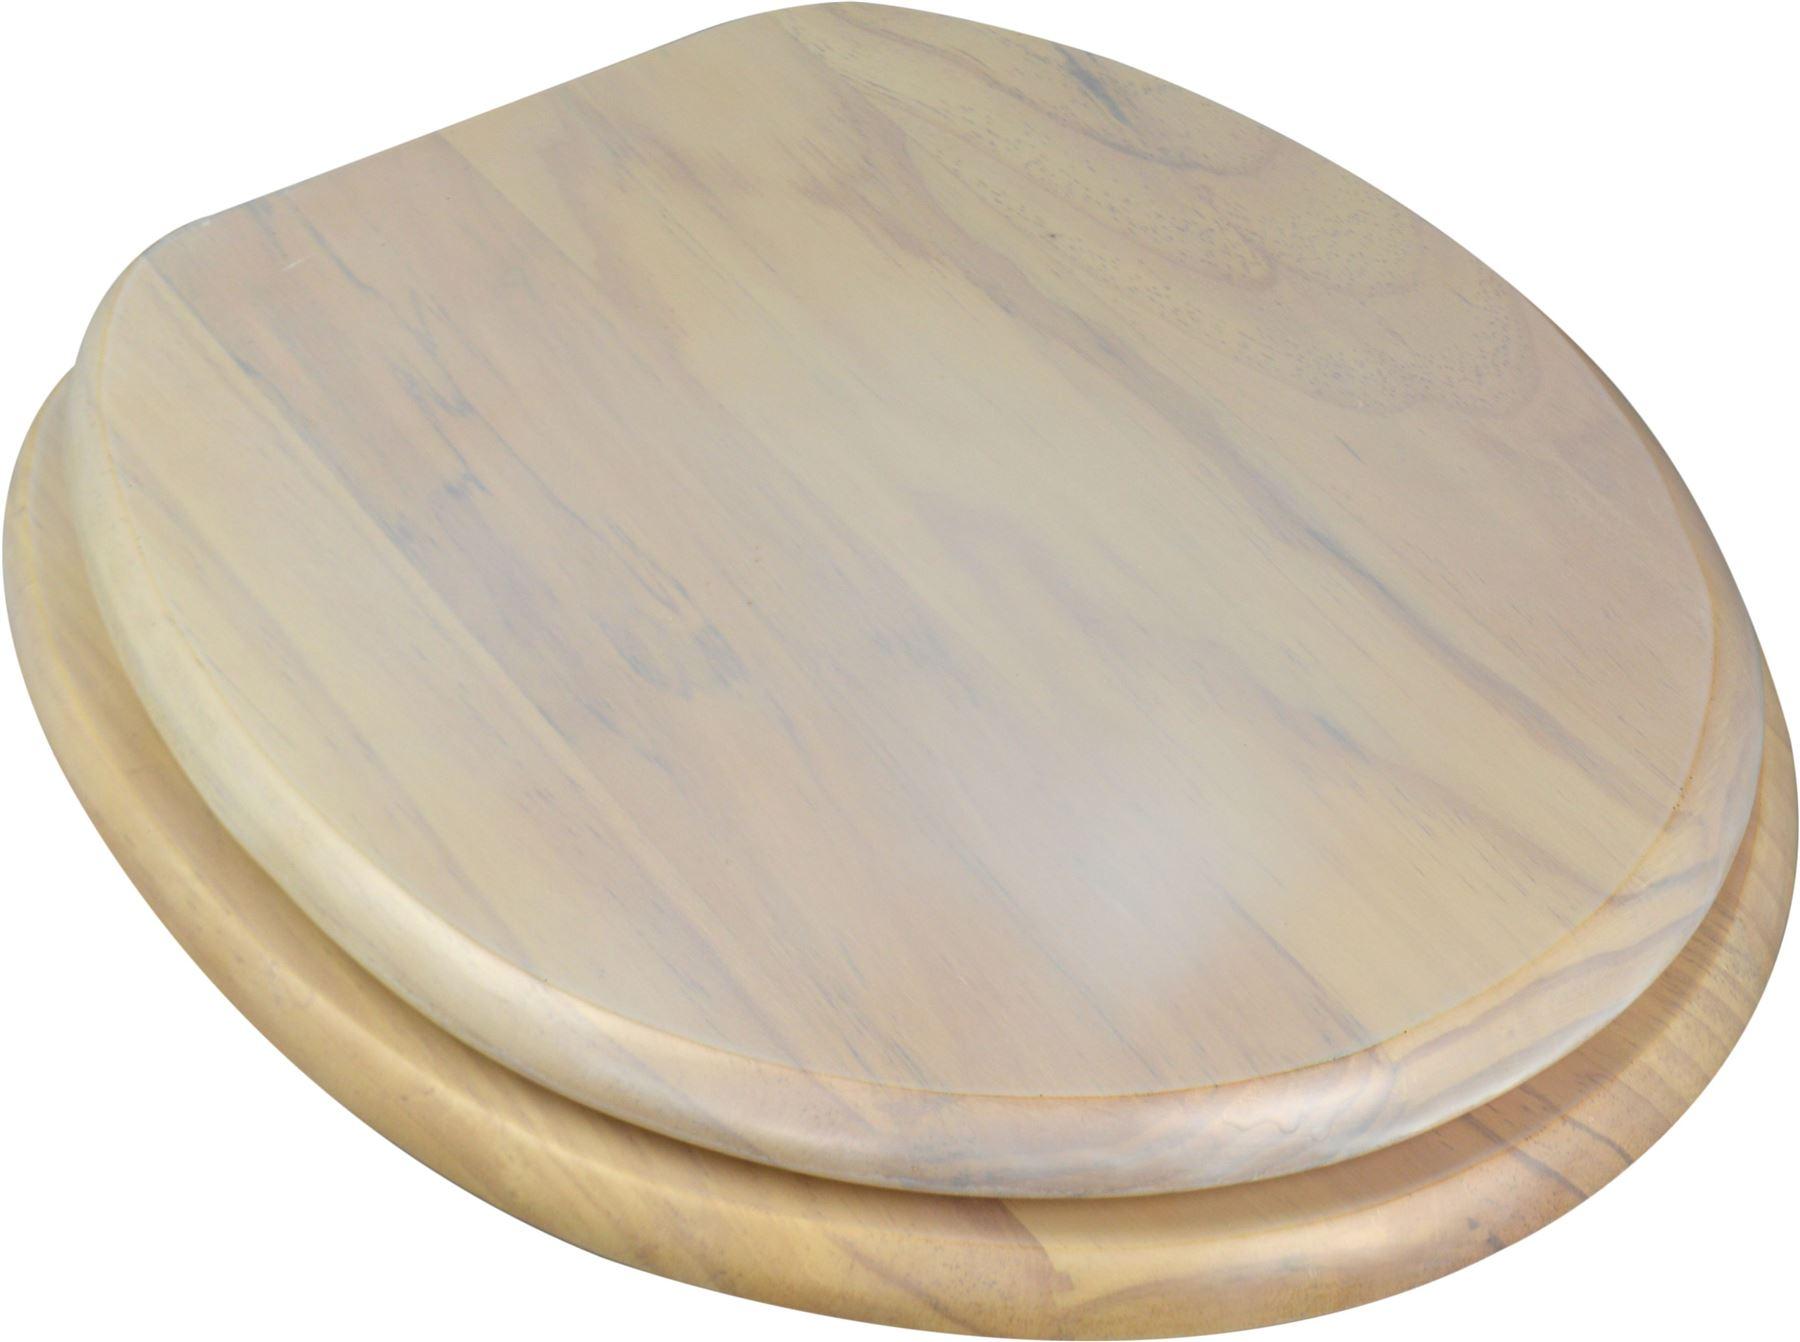 Wooden Bathroom Toilet Seat Light White Pine Fixings Included EBay